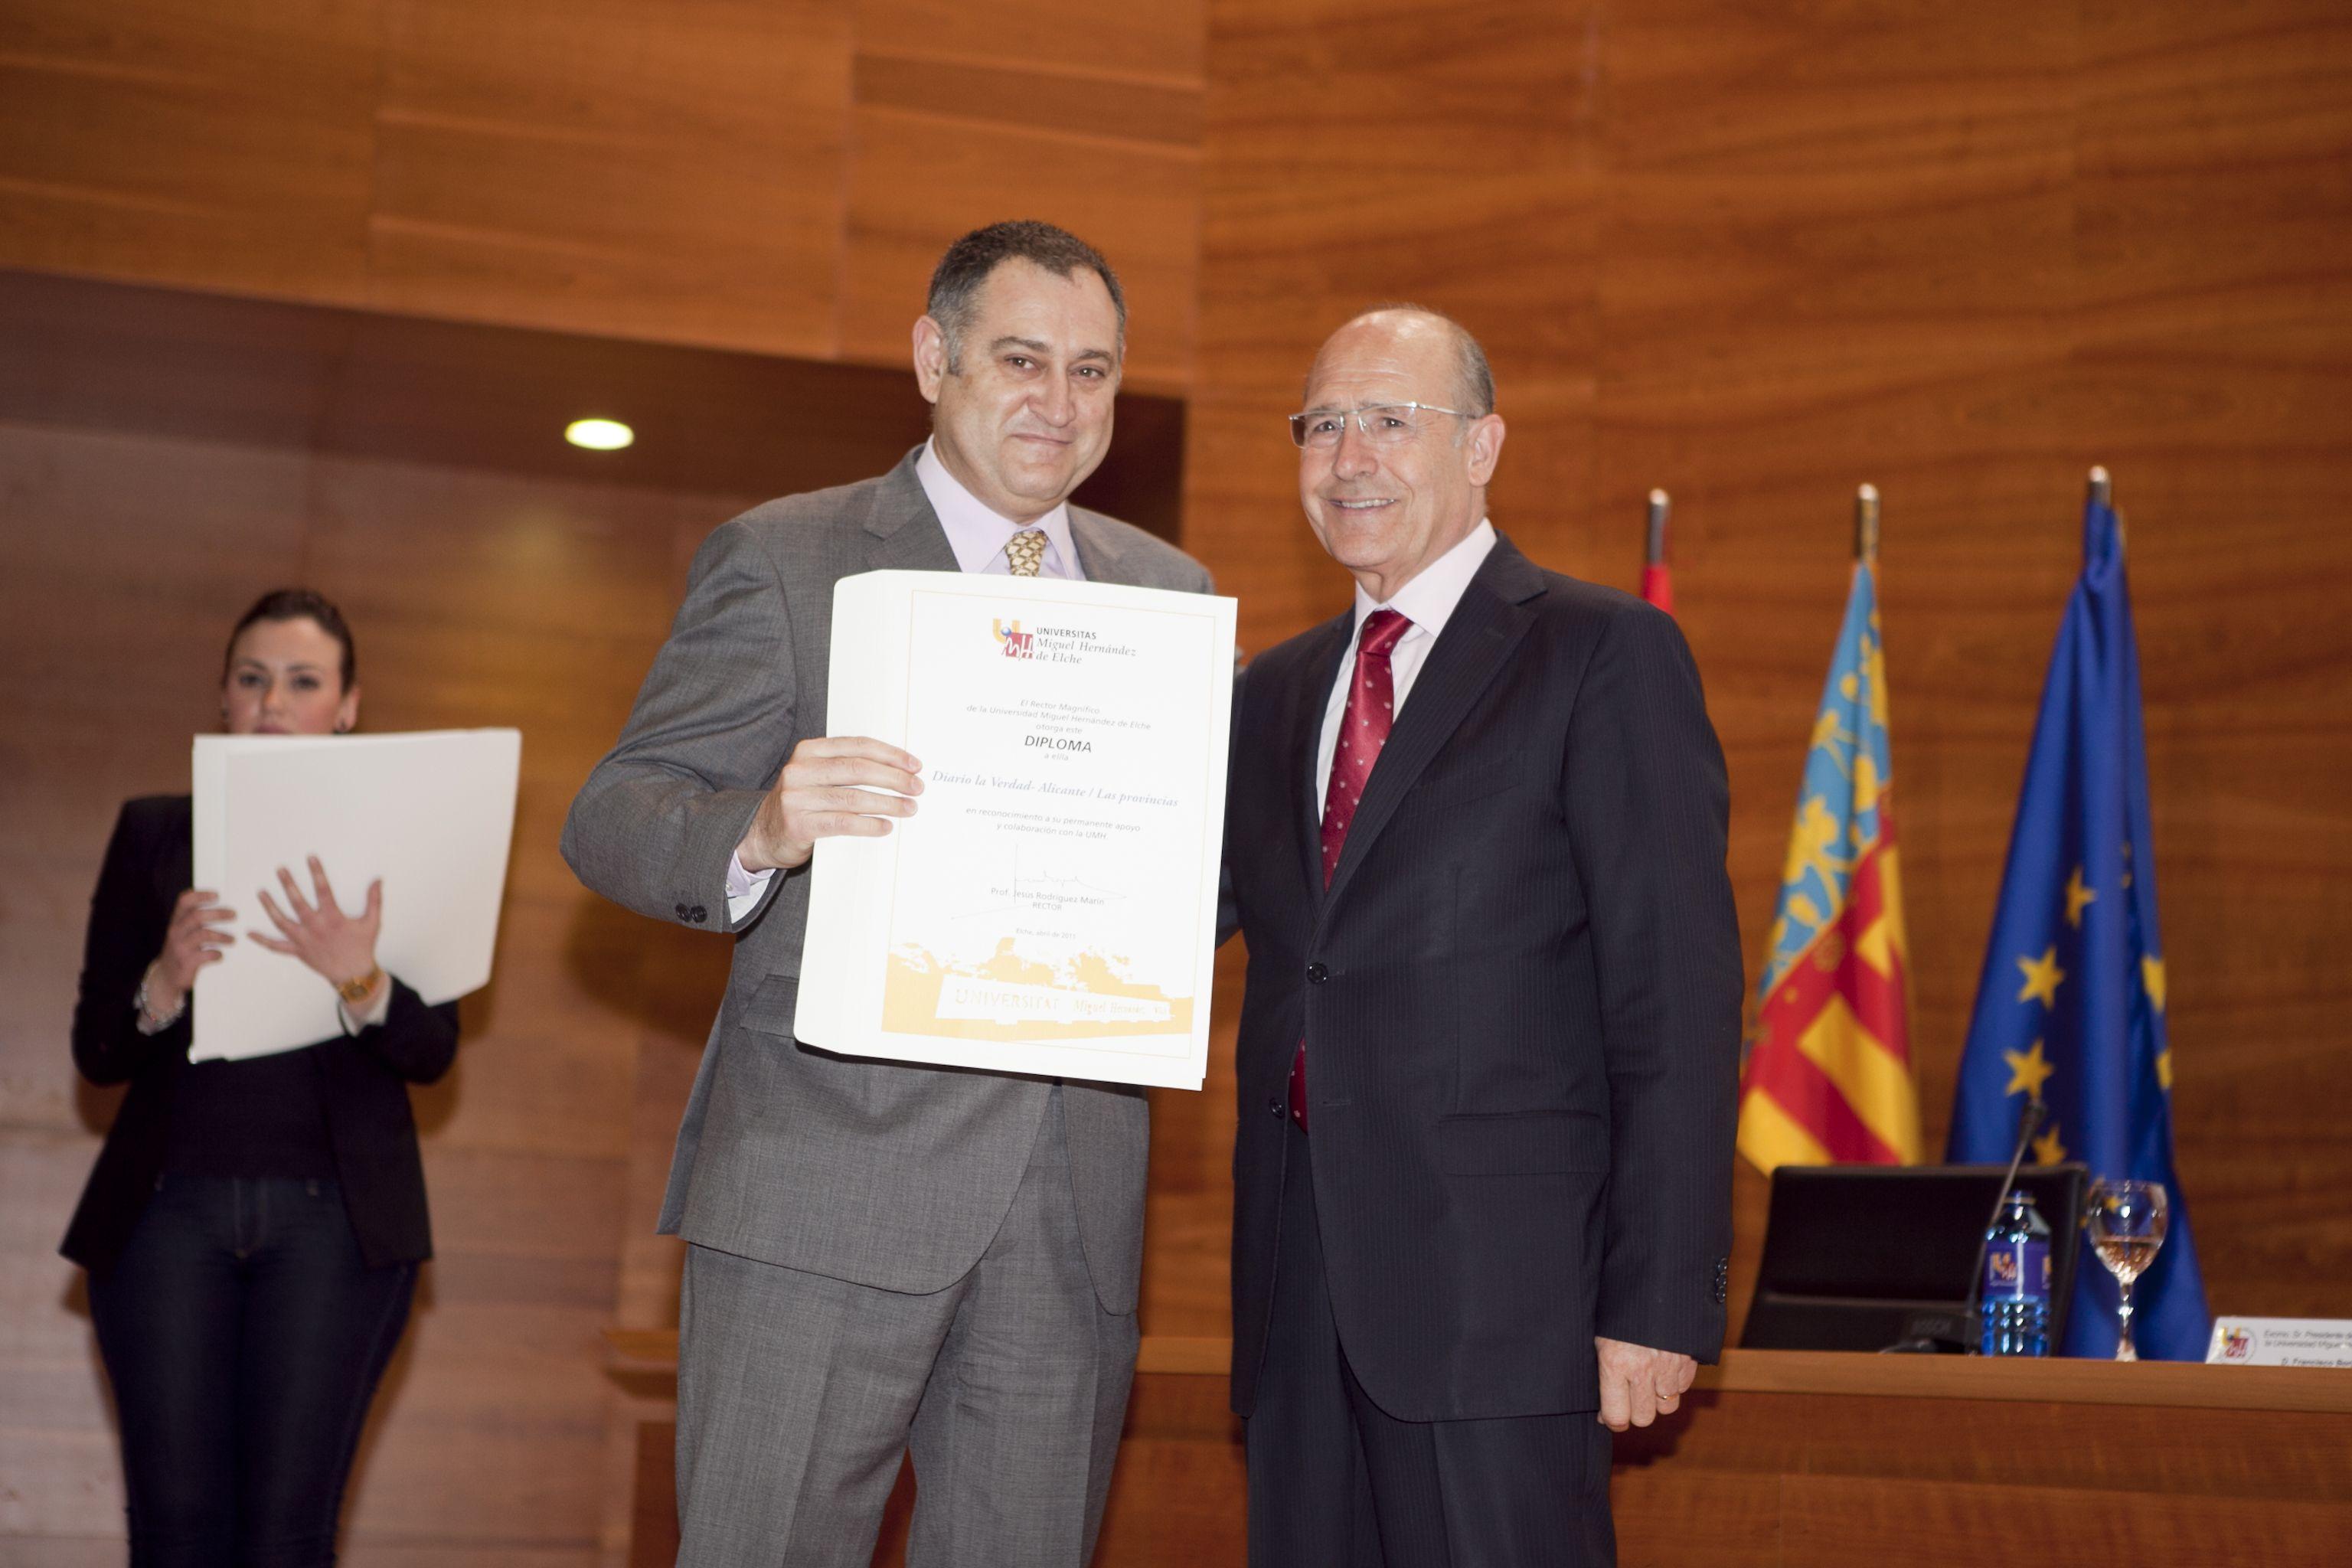 umh-diplomas-rector_mg_6868.jpg